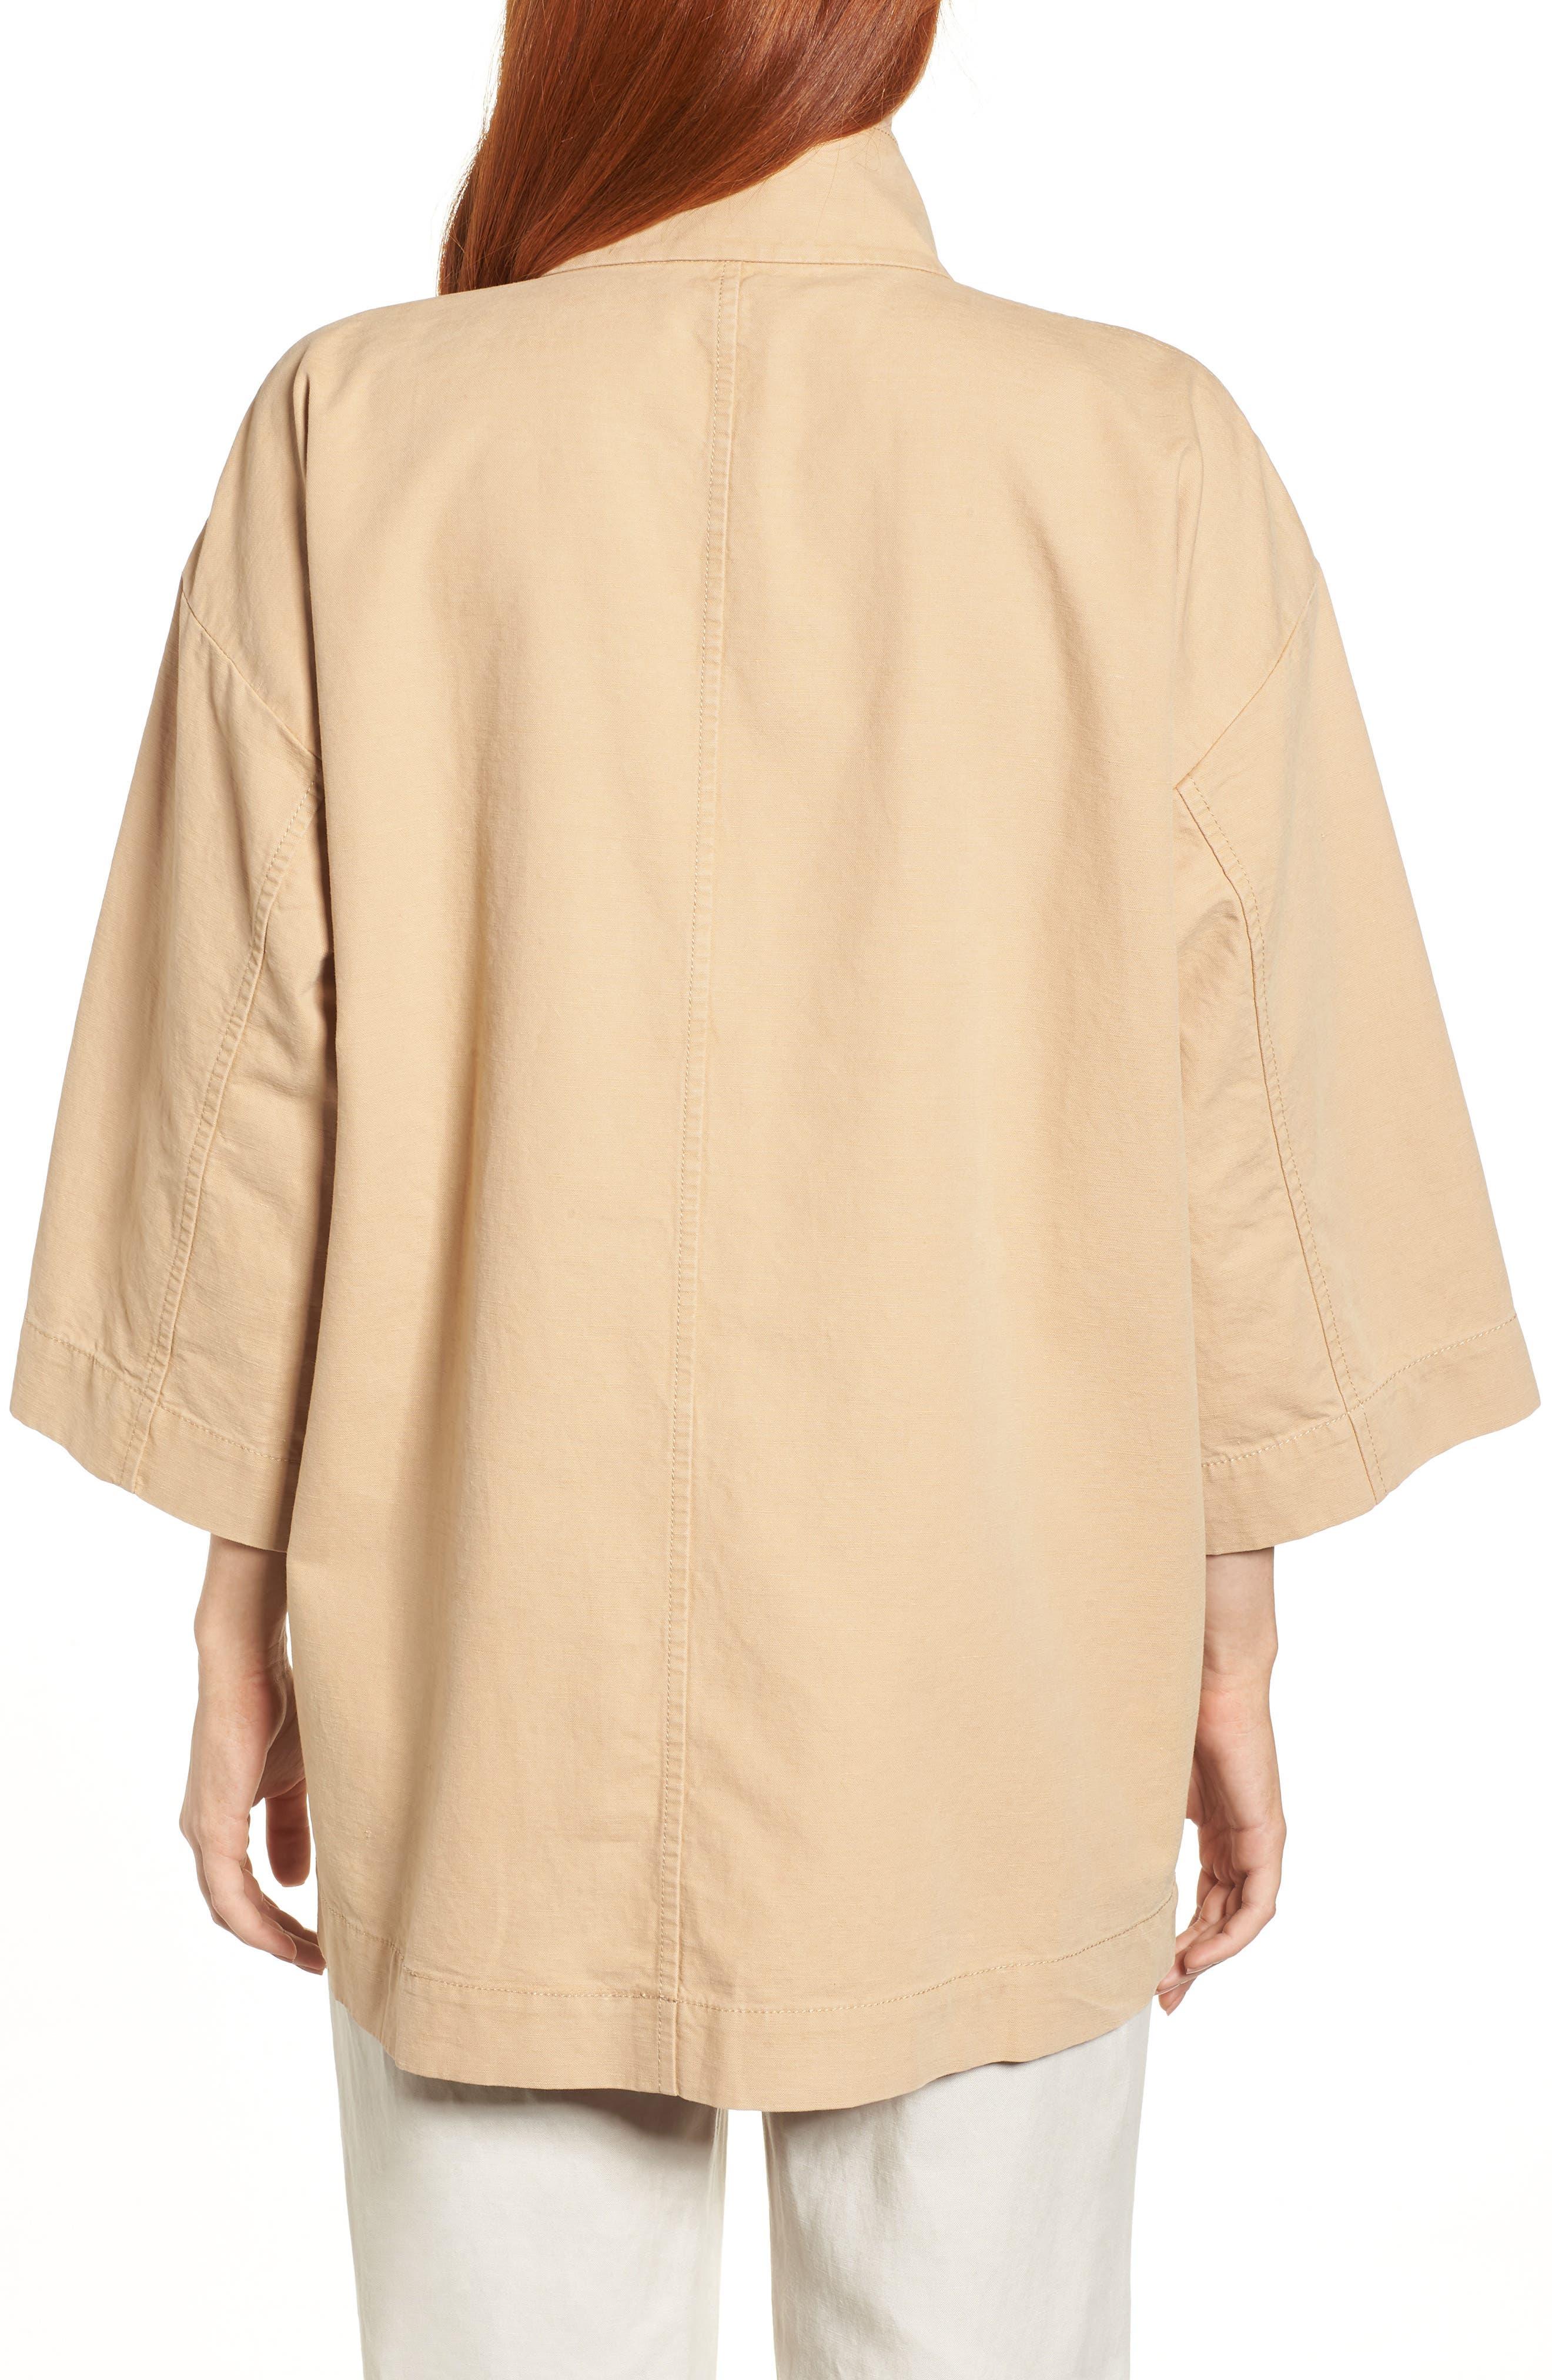 Organic Cotton & Hemp Jacket,                             Alternate thumbnail 2, color,                             Wheat